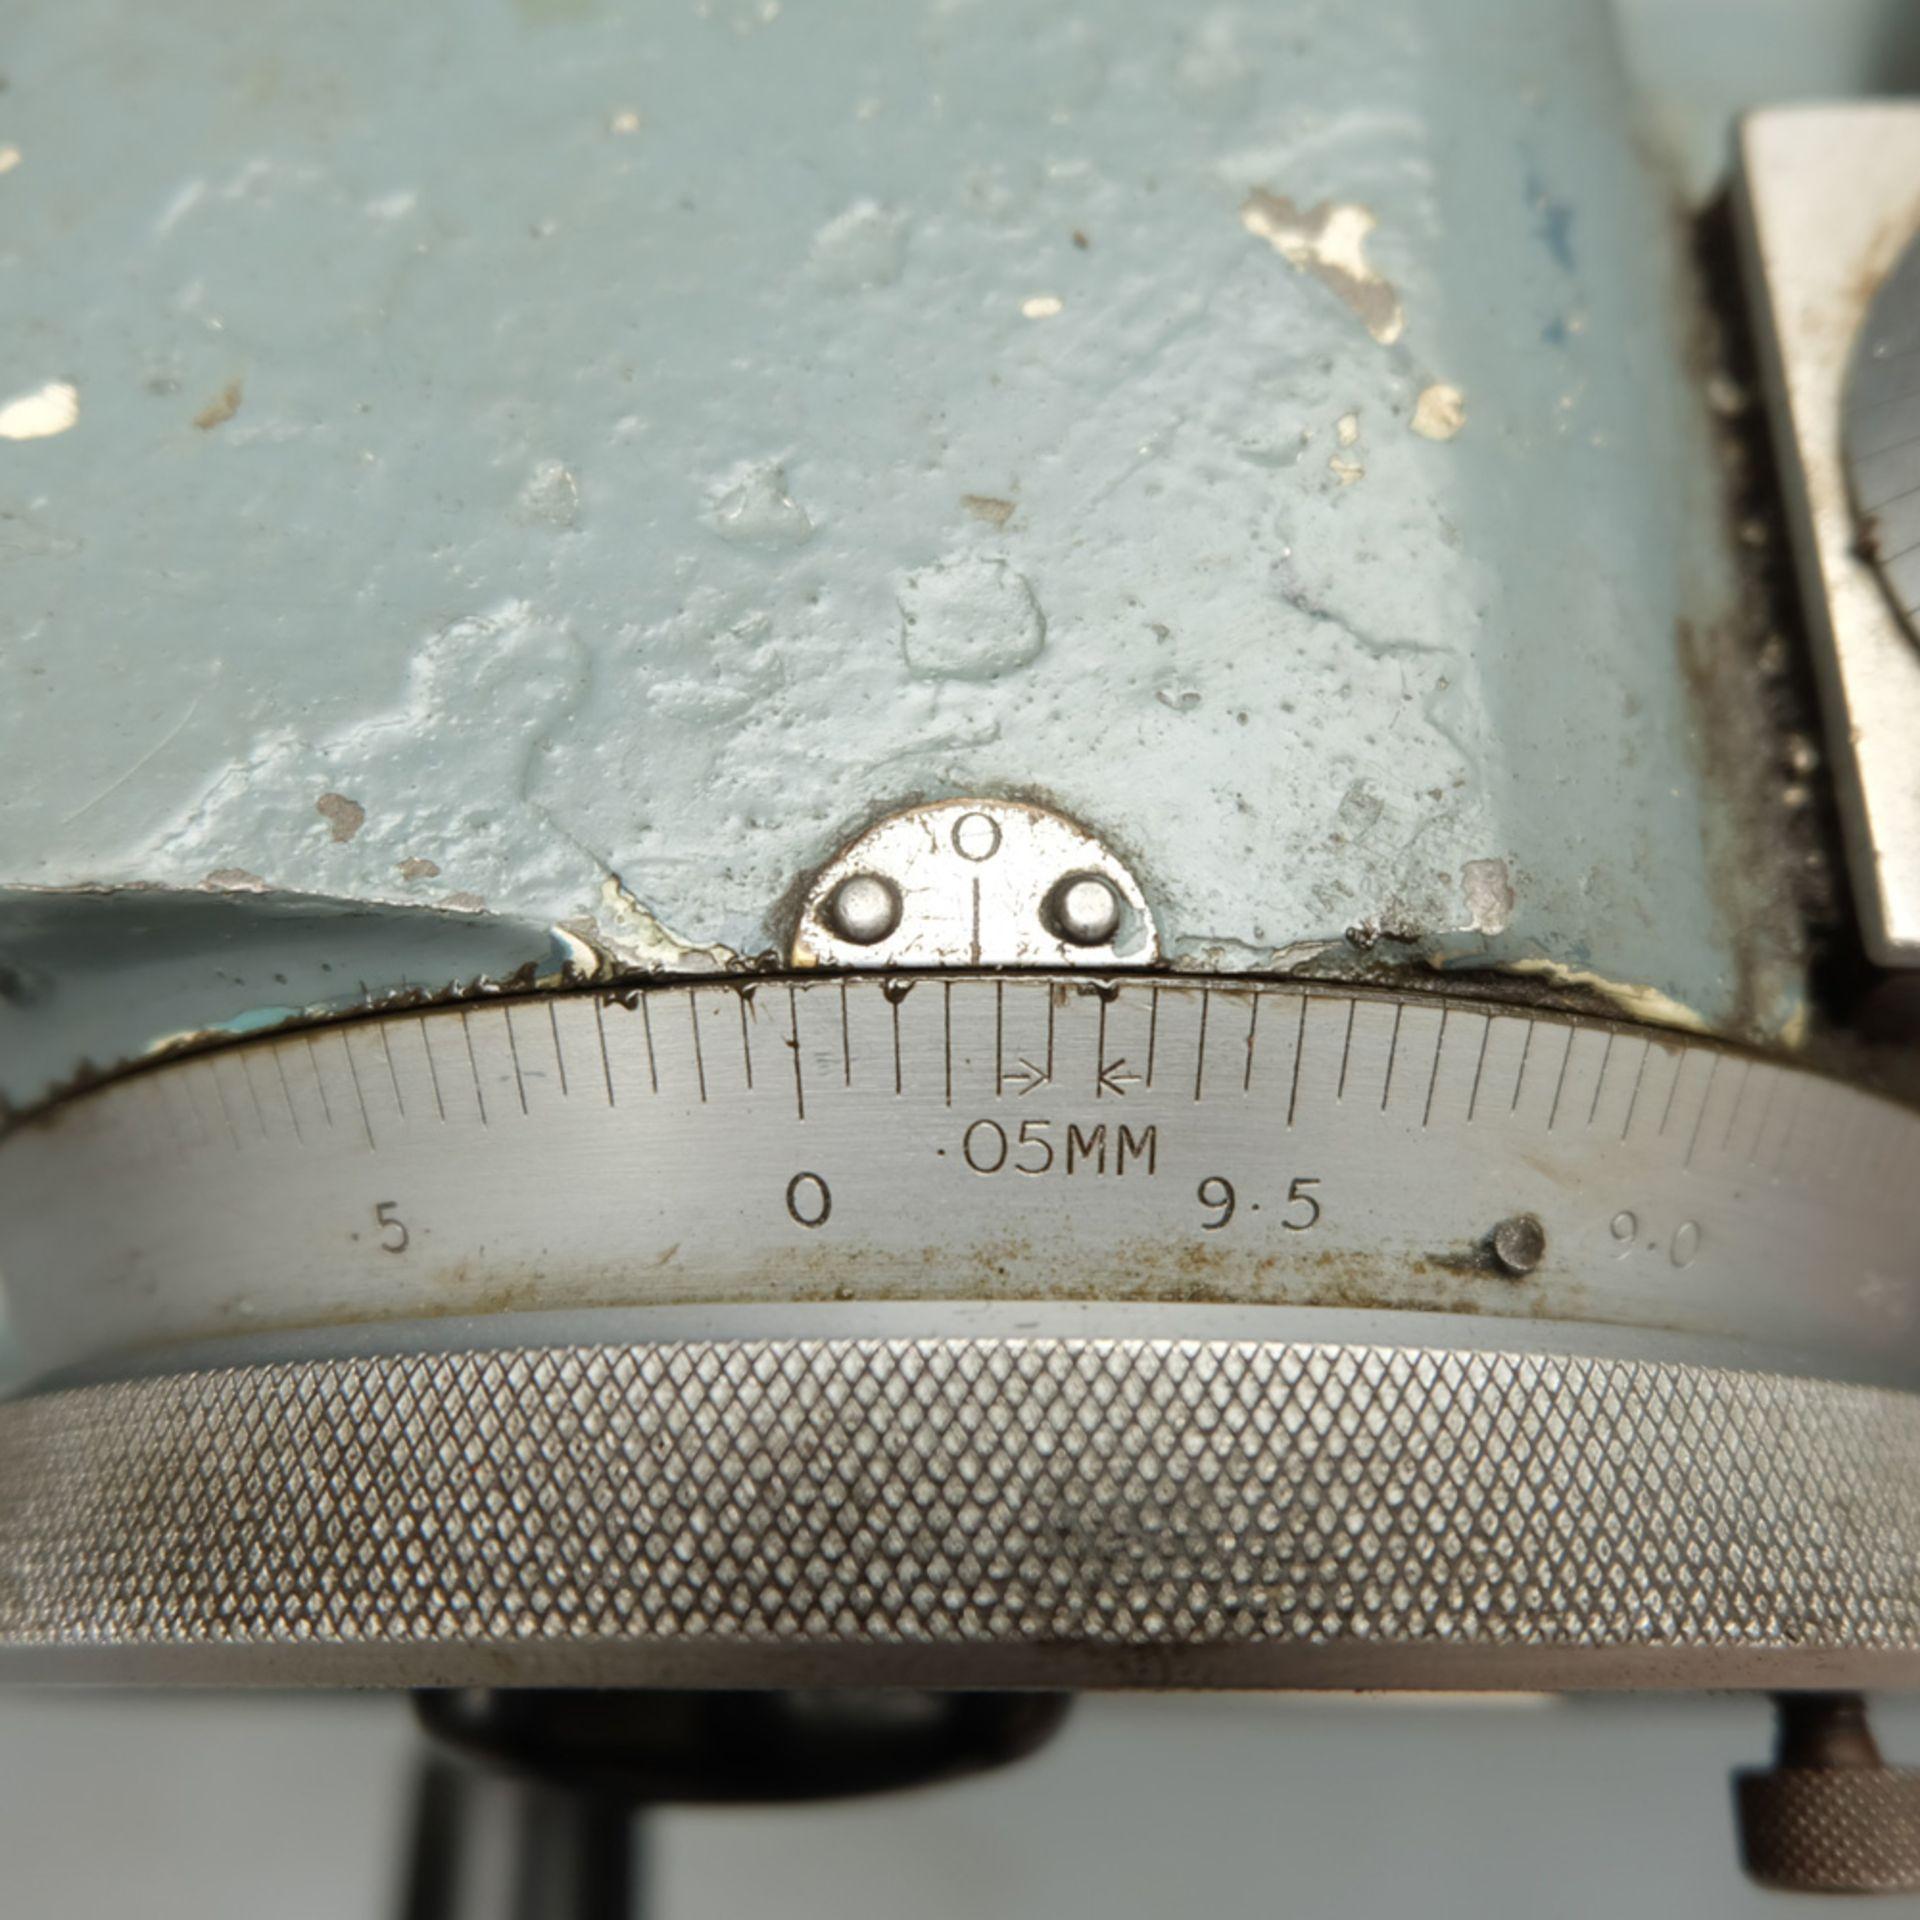 Jones & Shipman 1400P Toolroom Surface Grinder. - Image 5 of 10